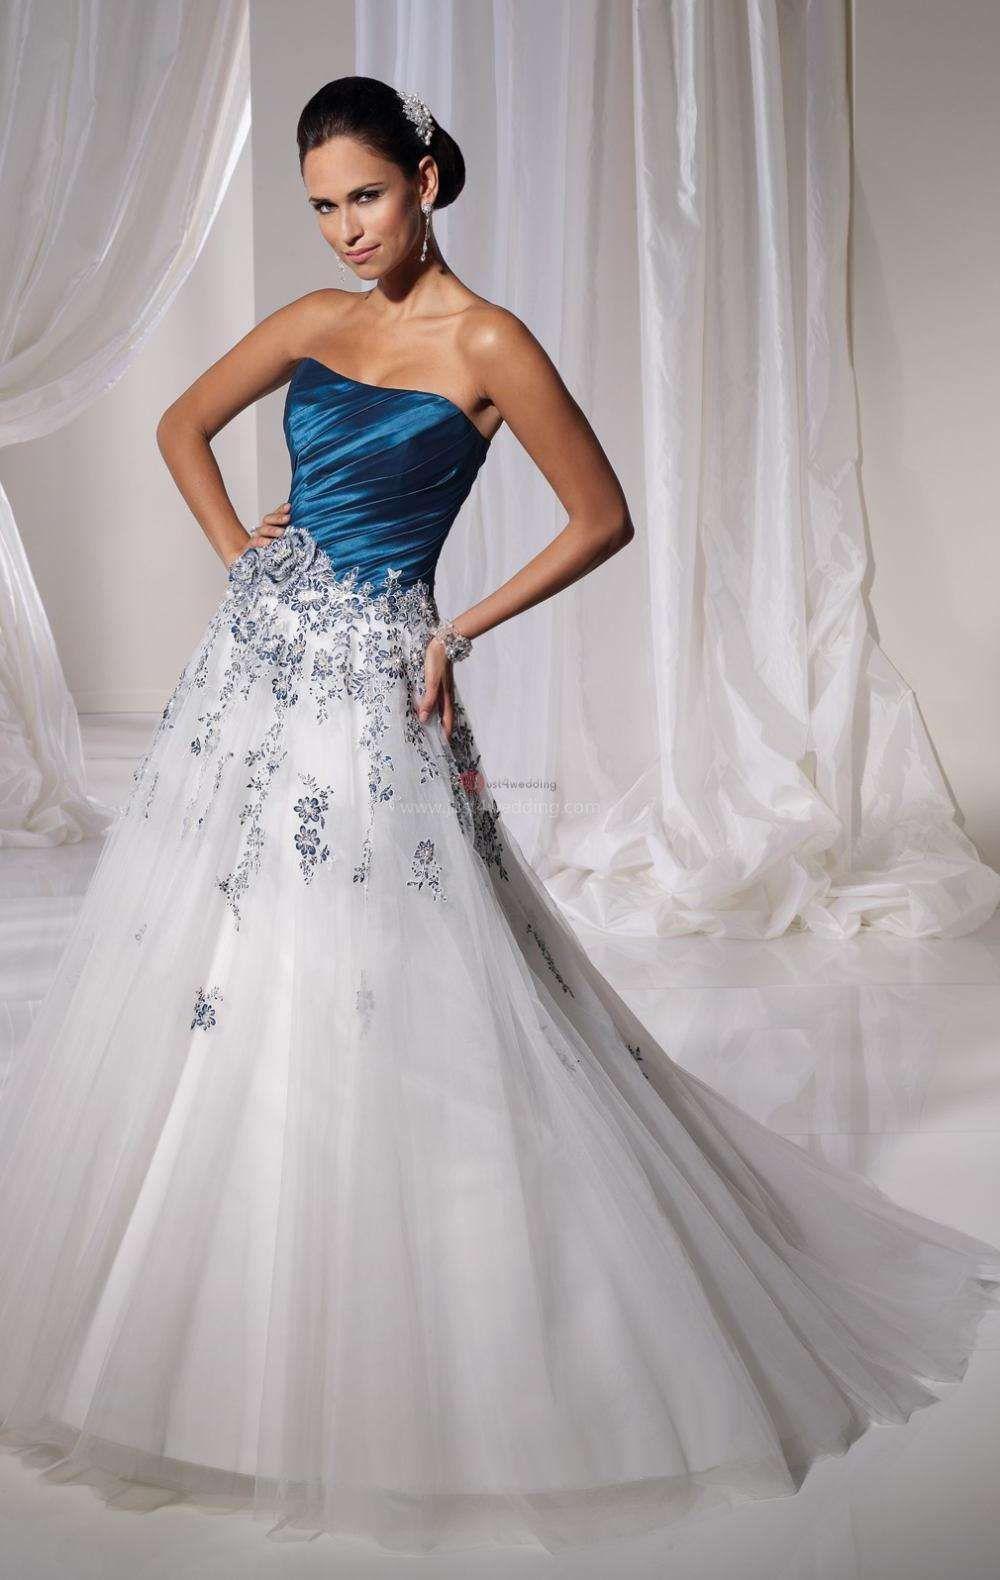 7dd8cb3e46 Ball Gown Wedding Dresses Blue. Ball Gown Wedding Dresses Blue. Colorful Royal  Blue Ball Gowns Wedding Dresses 2018 Custom Made Y